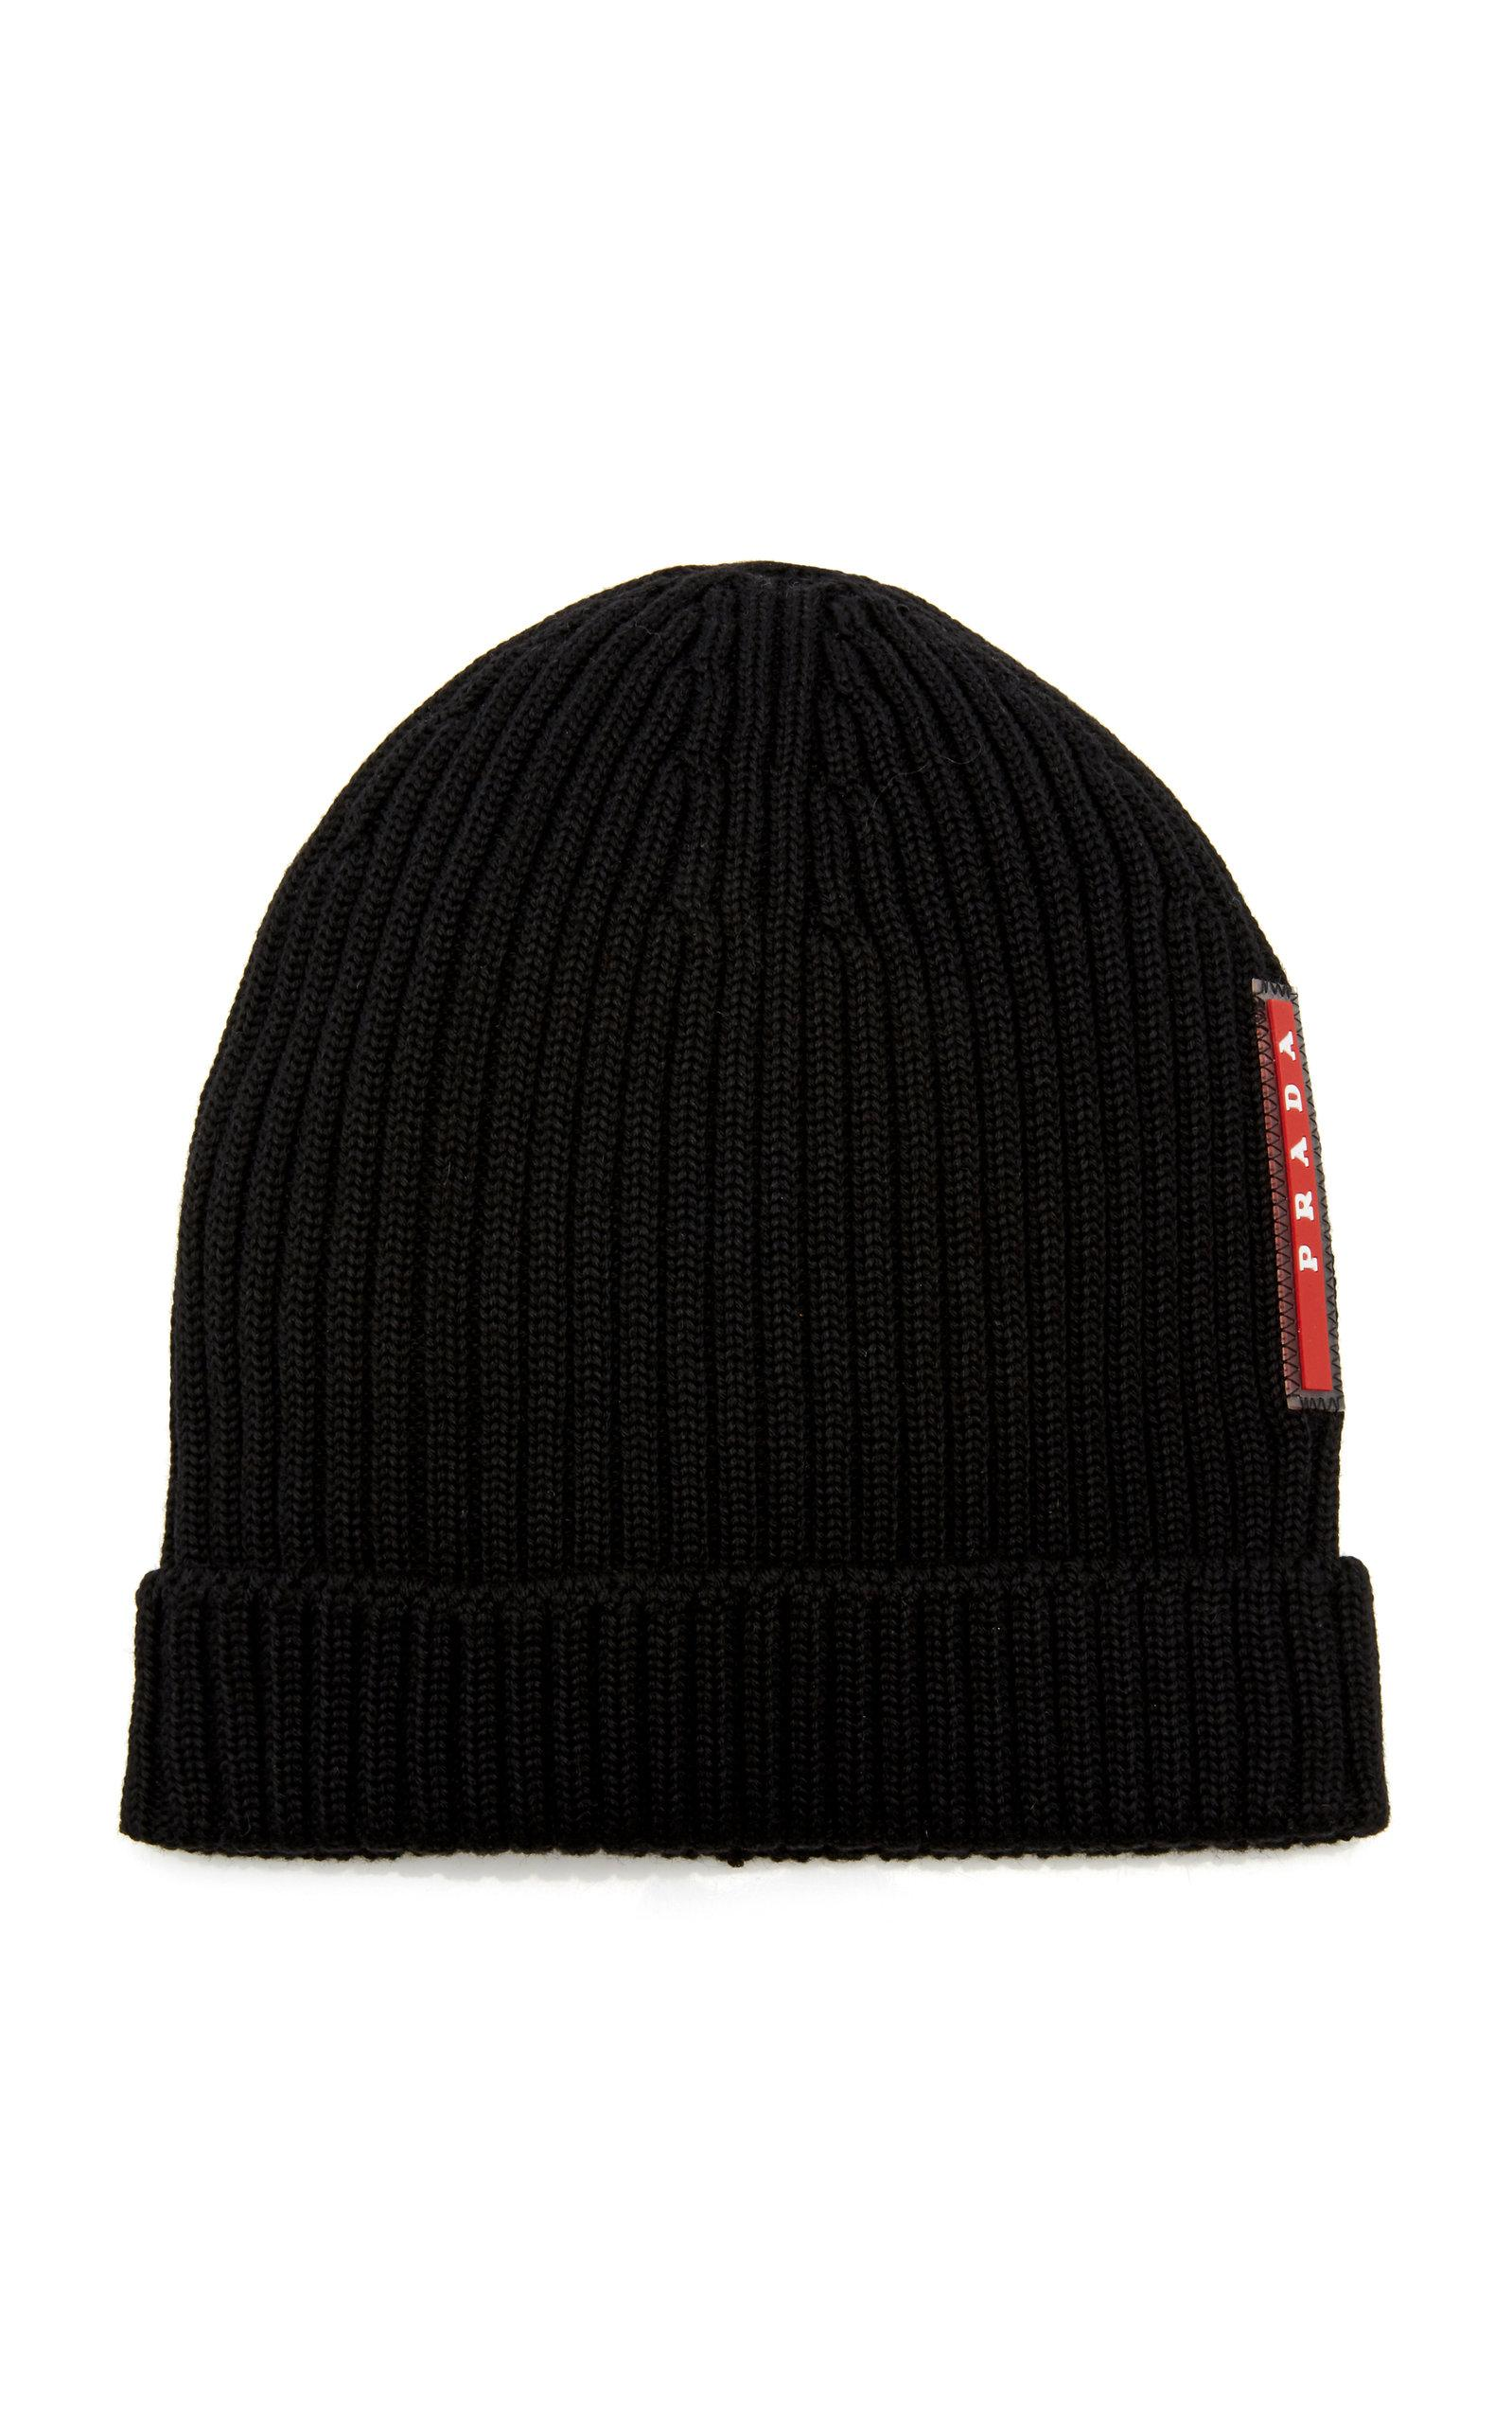 10f1d92fbf5 Prada Logo-appliquéd Ribbed Wool Beanie in Black for Men - Save 52 ...